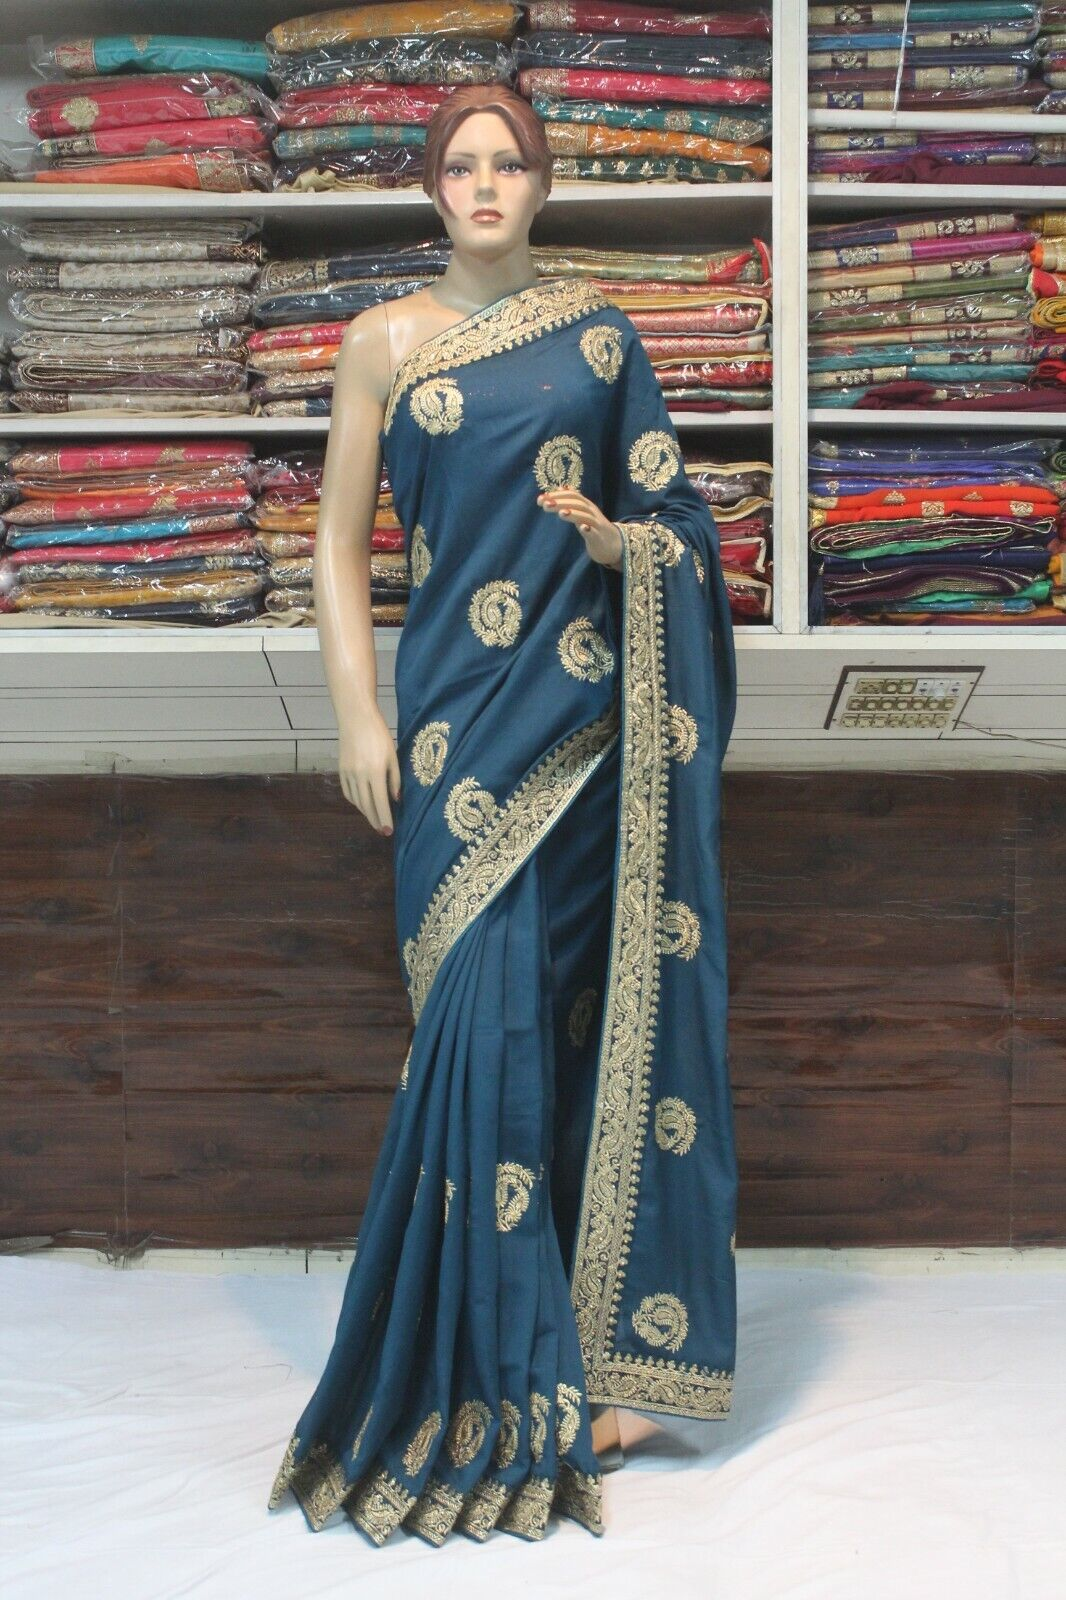 Bollywood Paisley Pattern Raw Silk Blue Saree Indian Designer Sari Party Dress